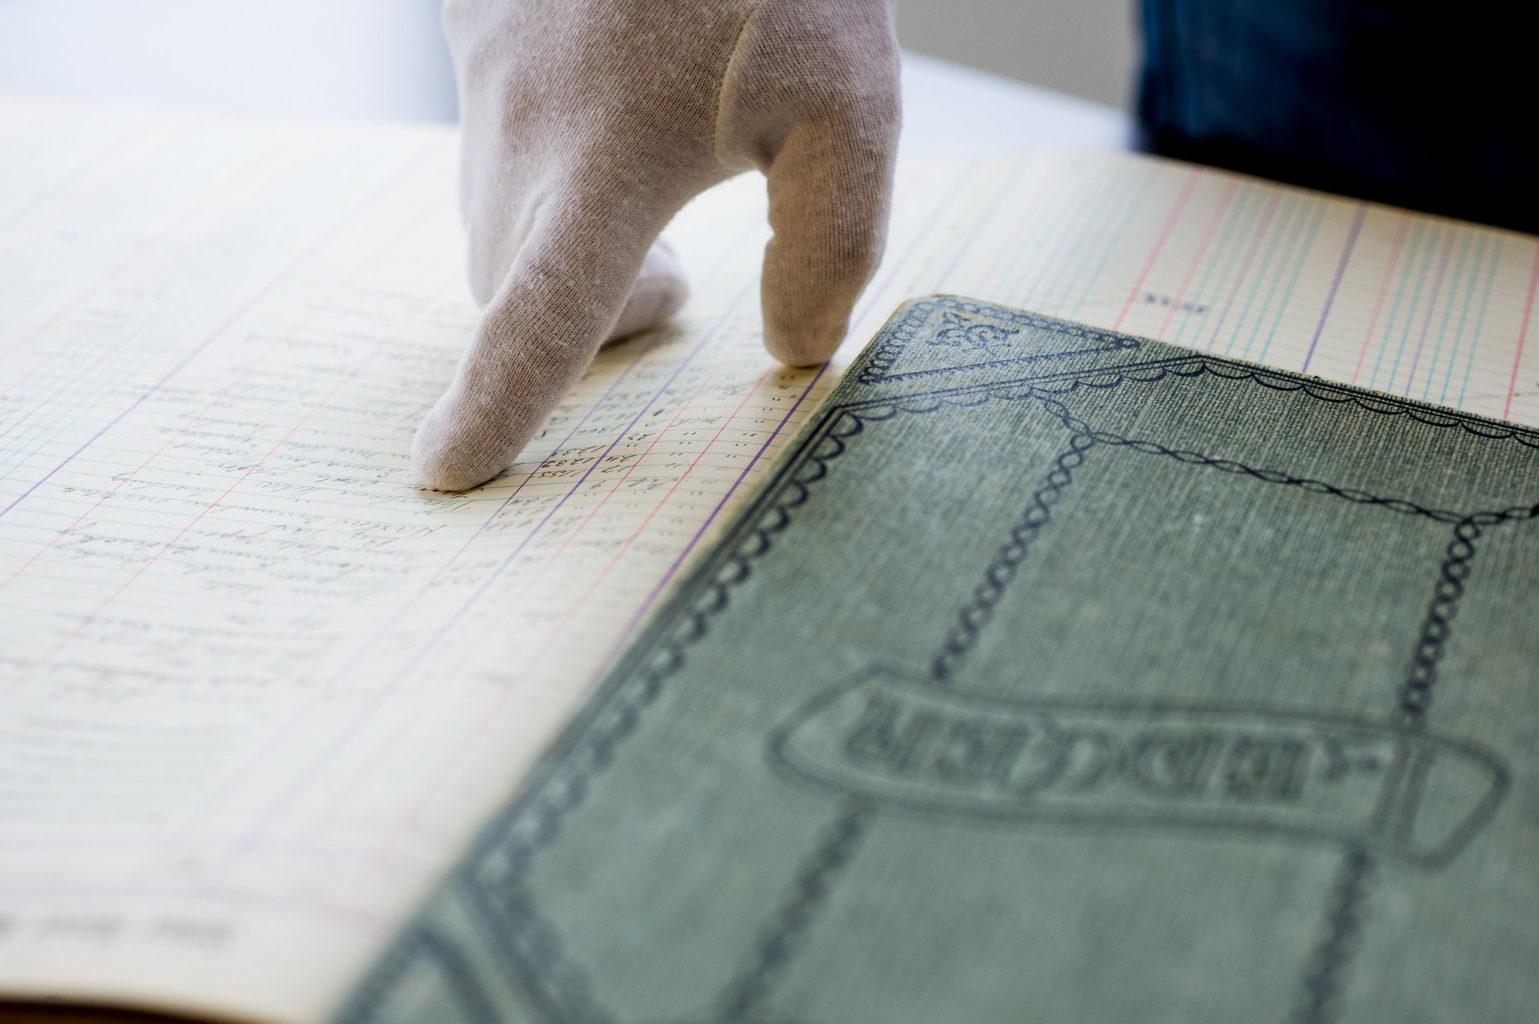 Historian examine an historical document.